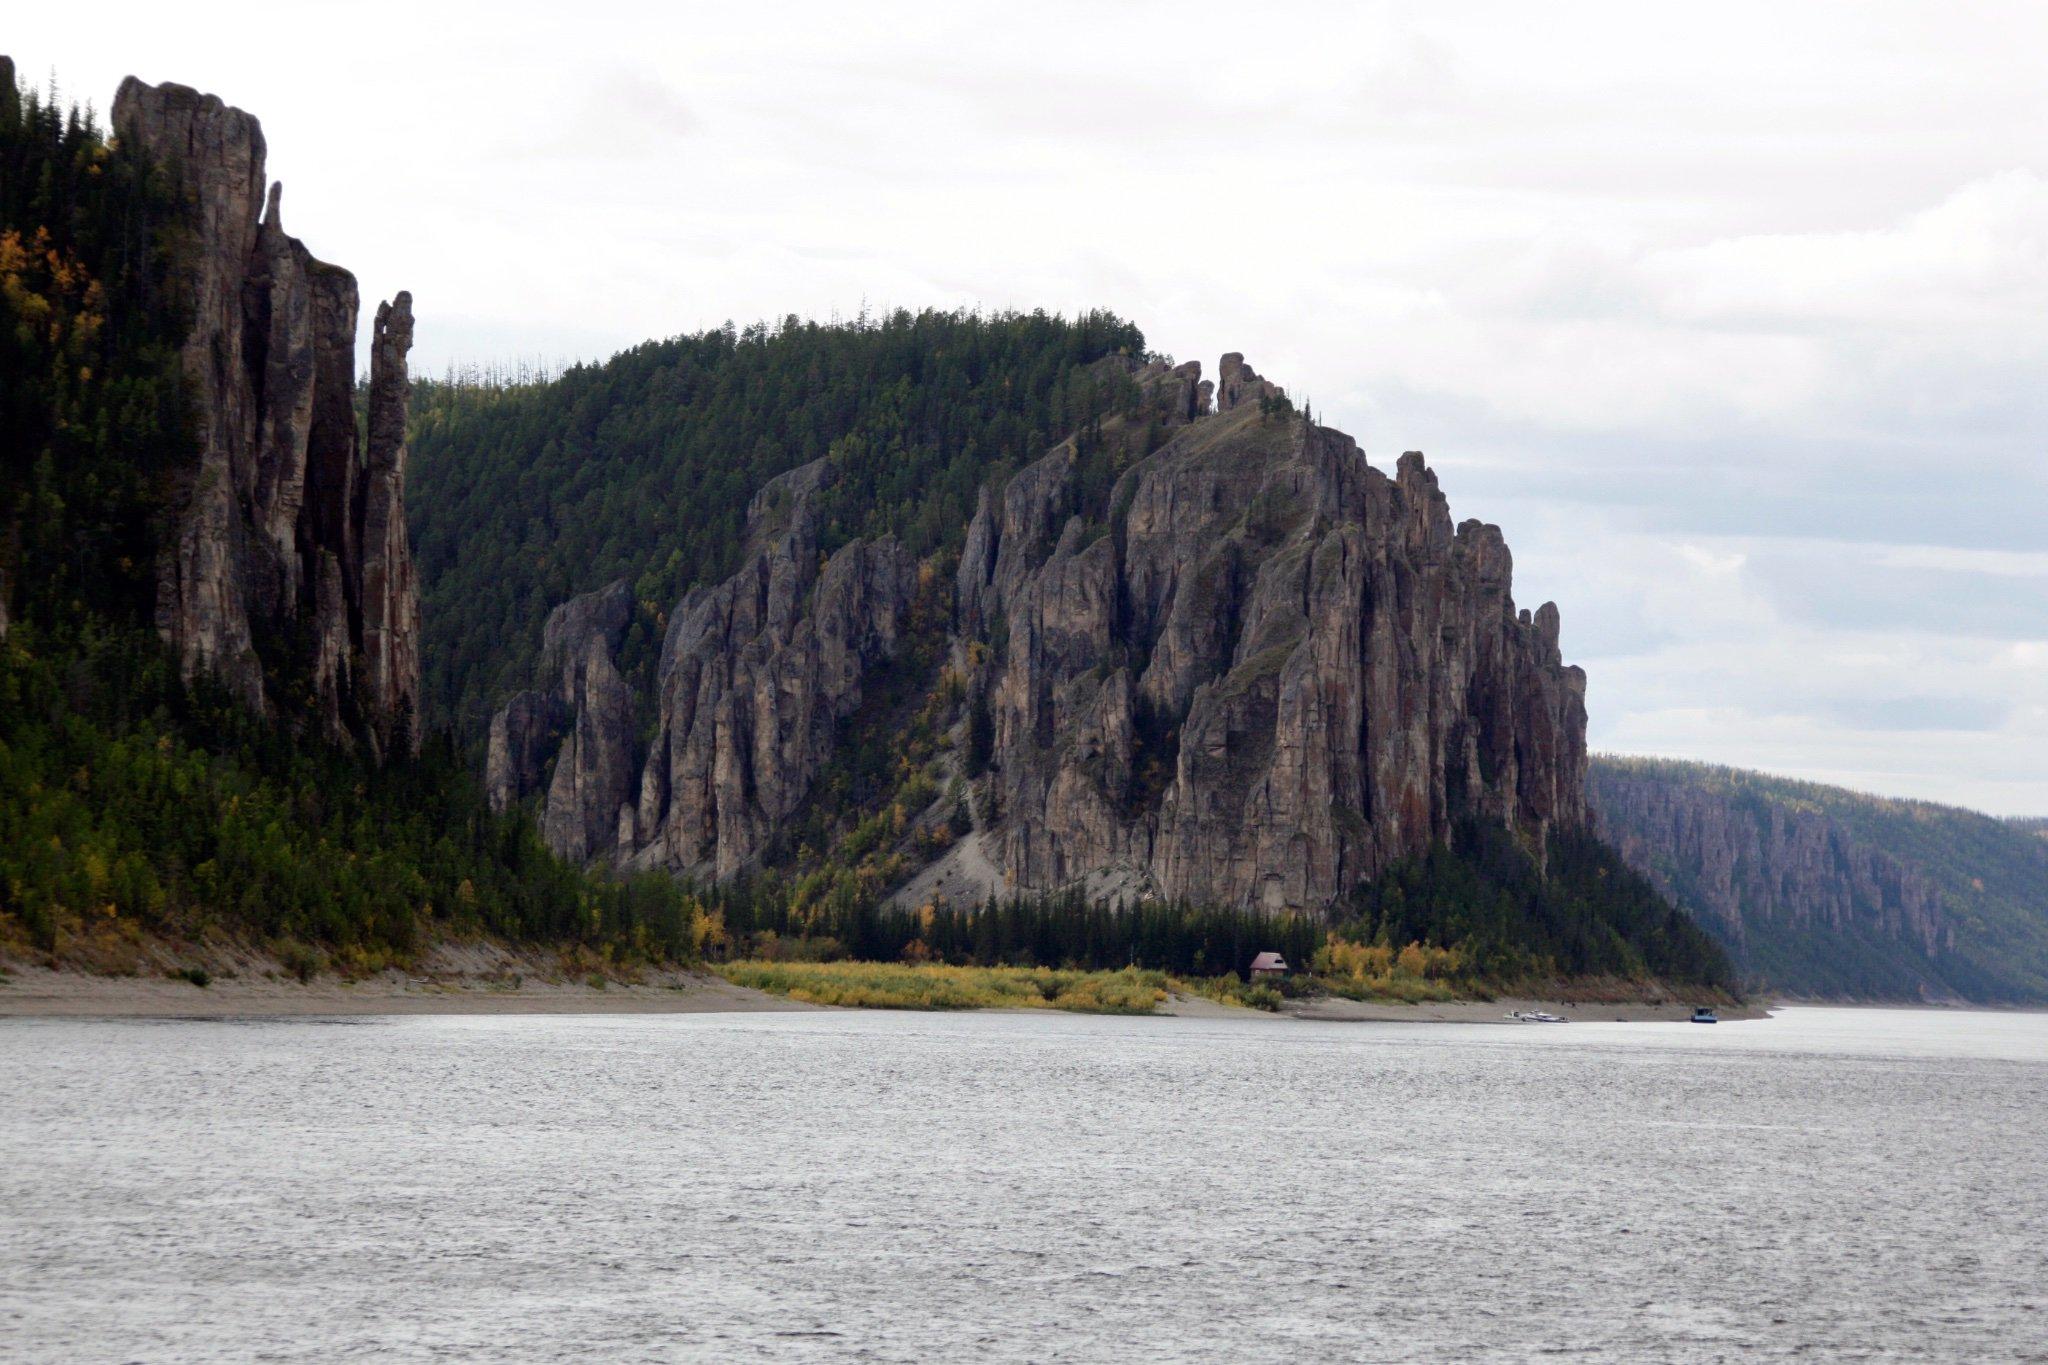 Lenskiye Stolby National Park to be created in Yakutia https://t.co/fPvGAcZlwX https://t.co/mw5RI5ij3x